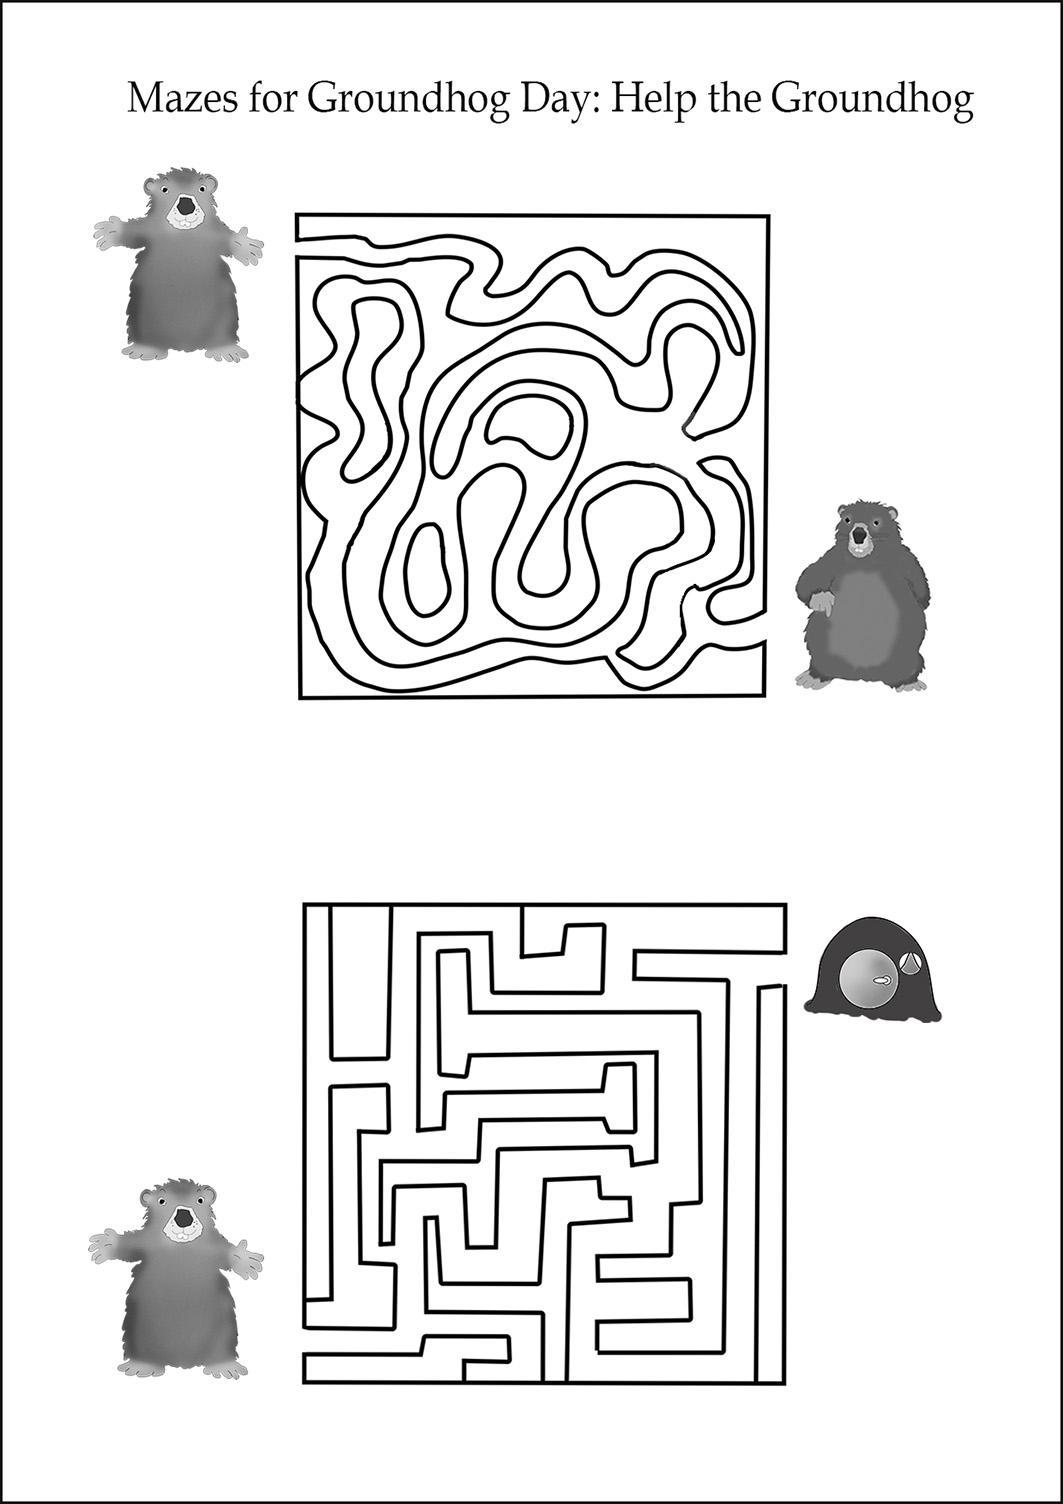 groundhog day mazes for kids